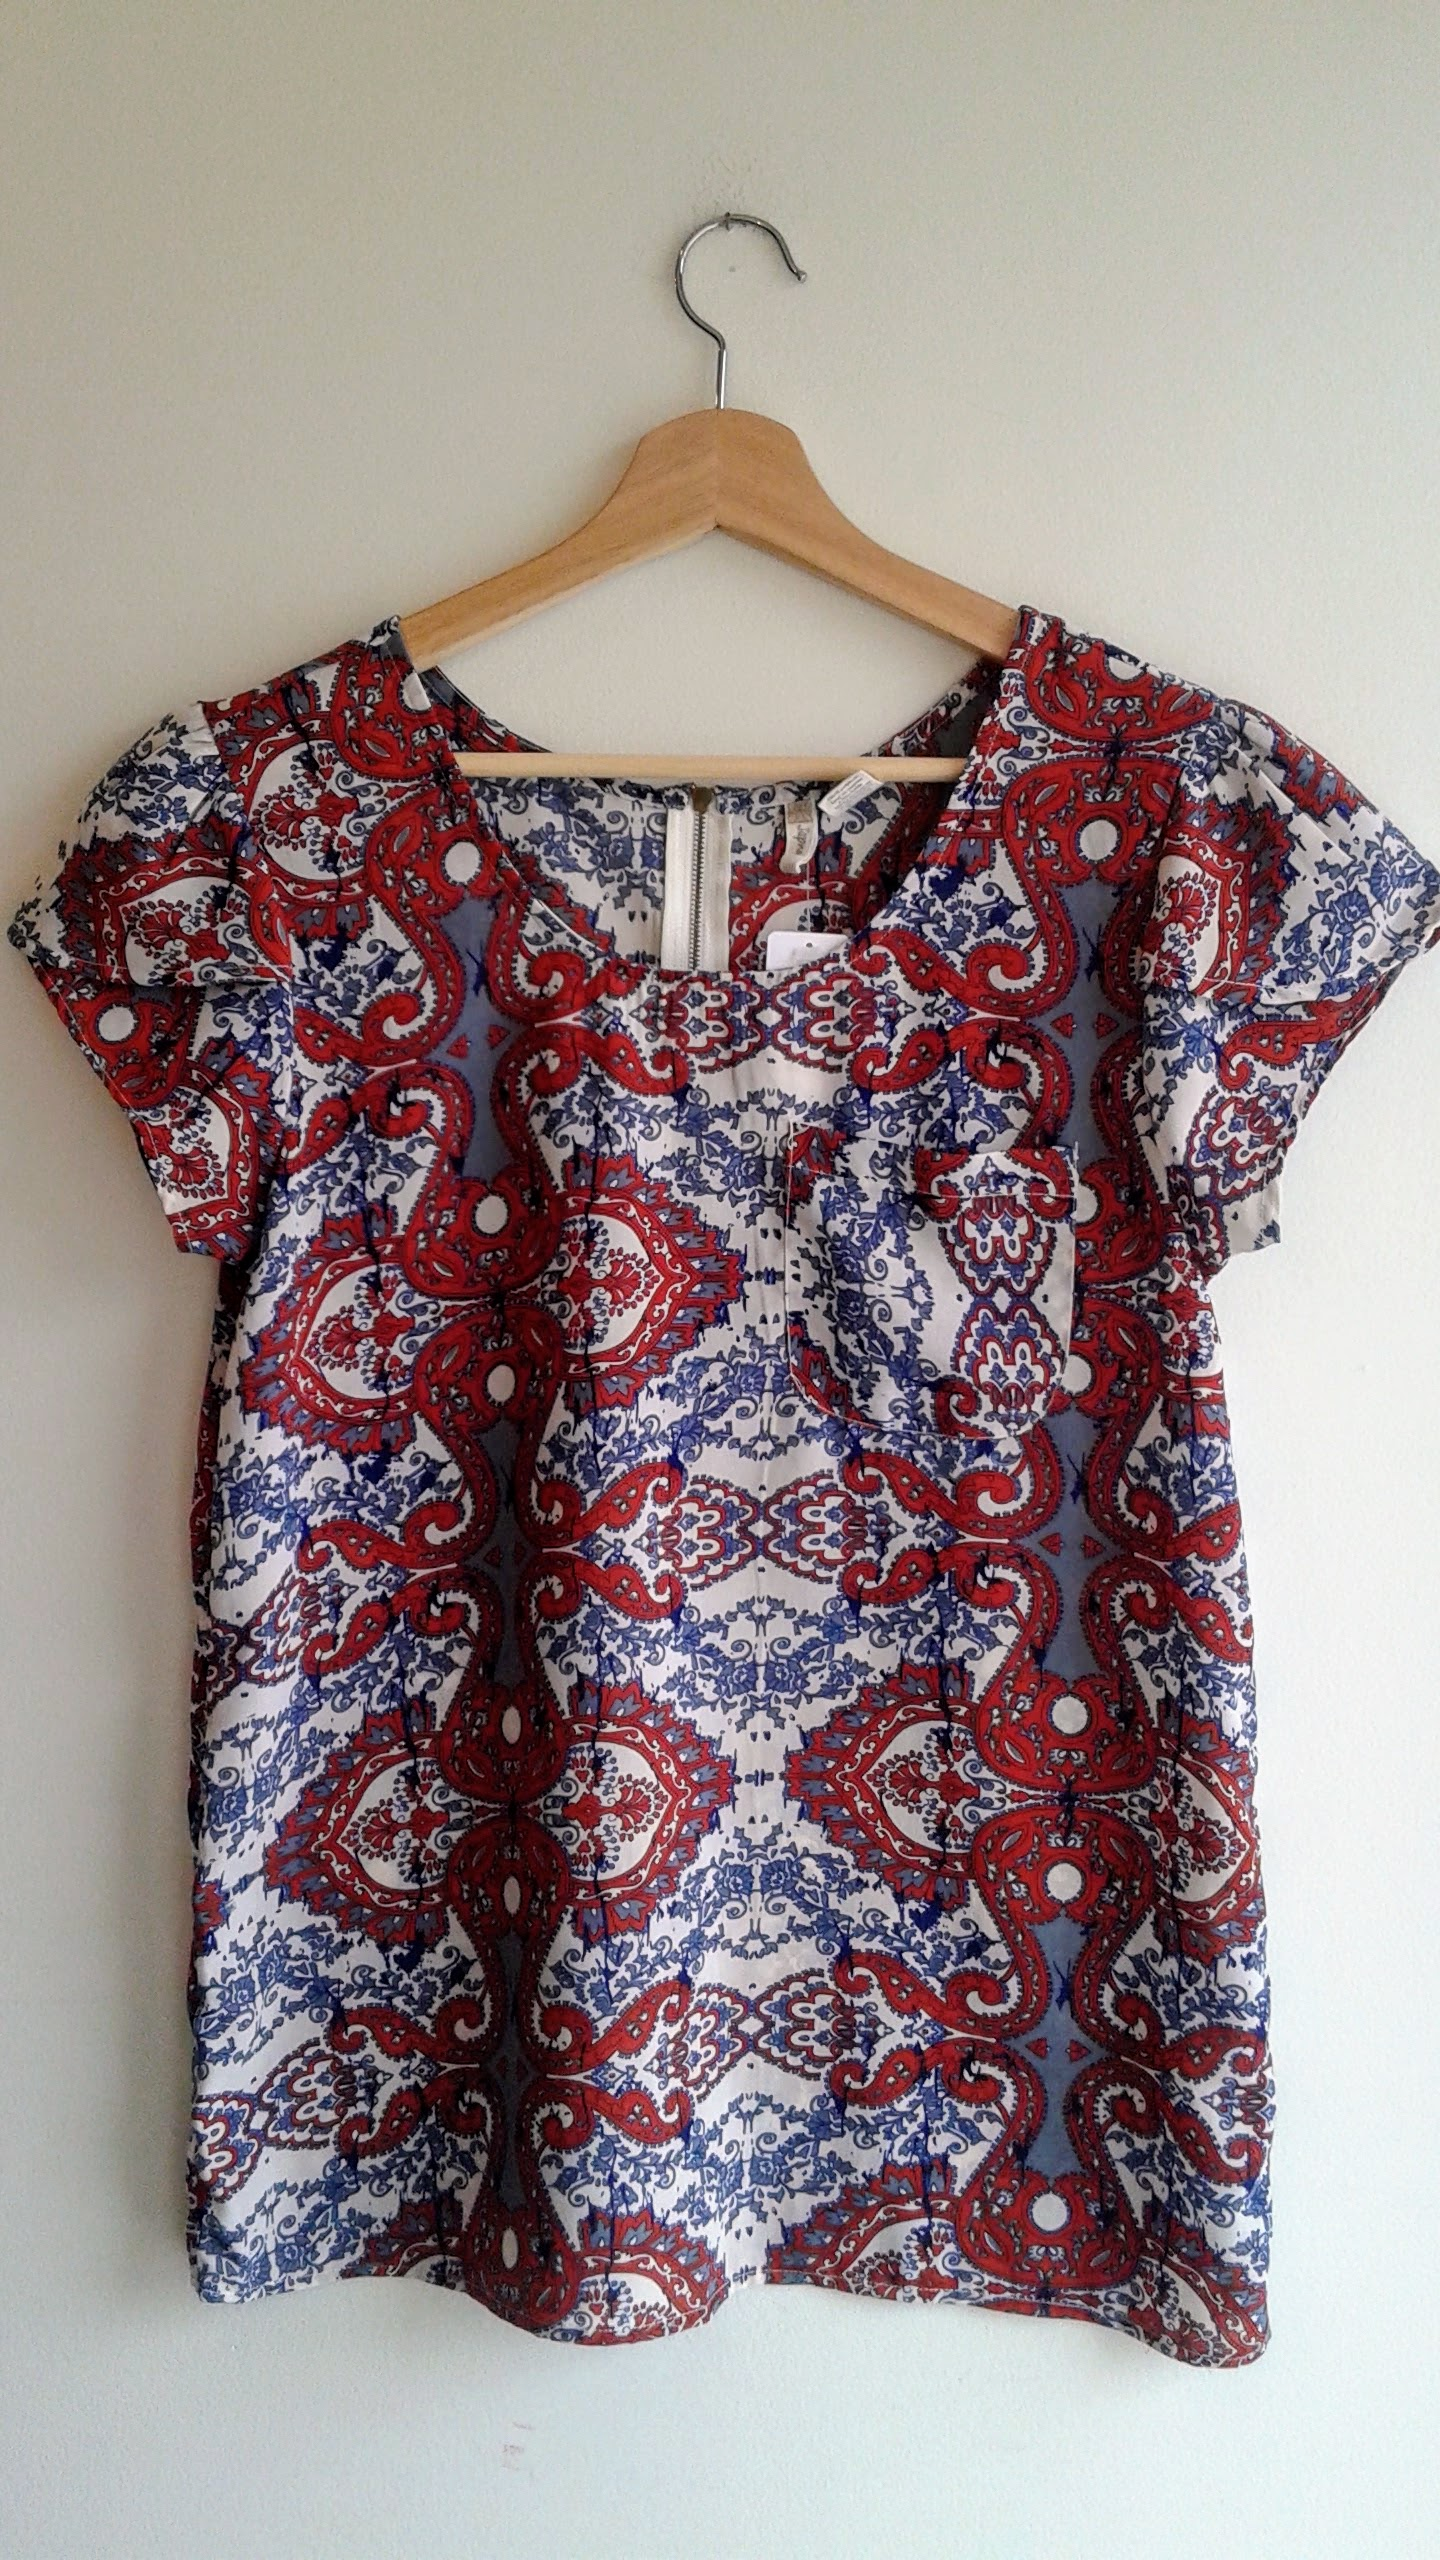 Japna top; Size M, $24